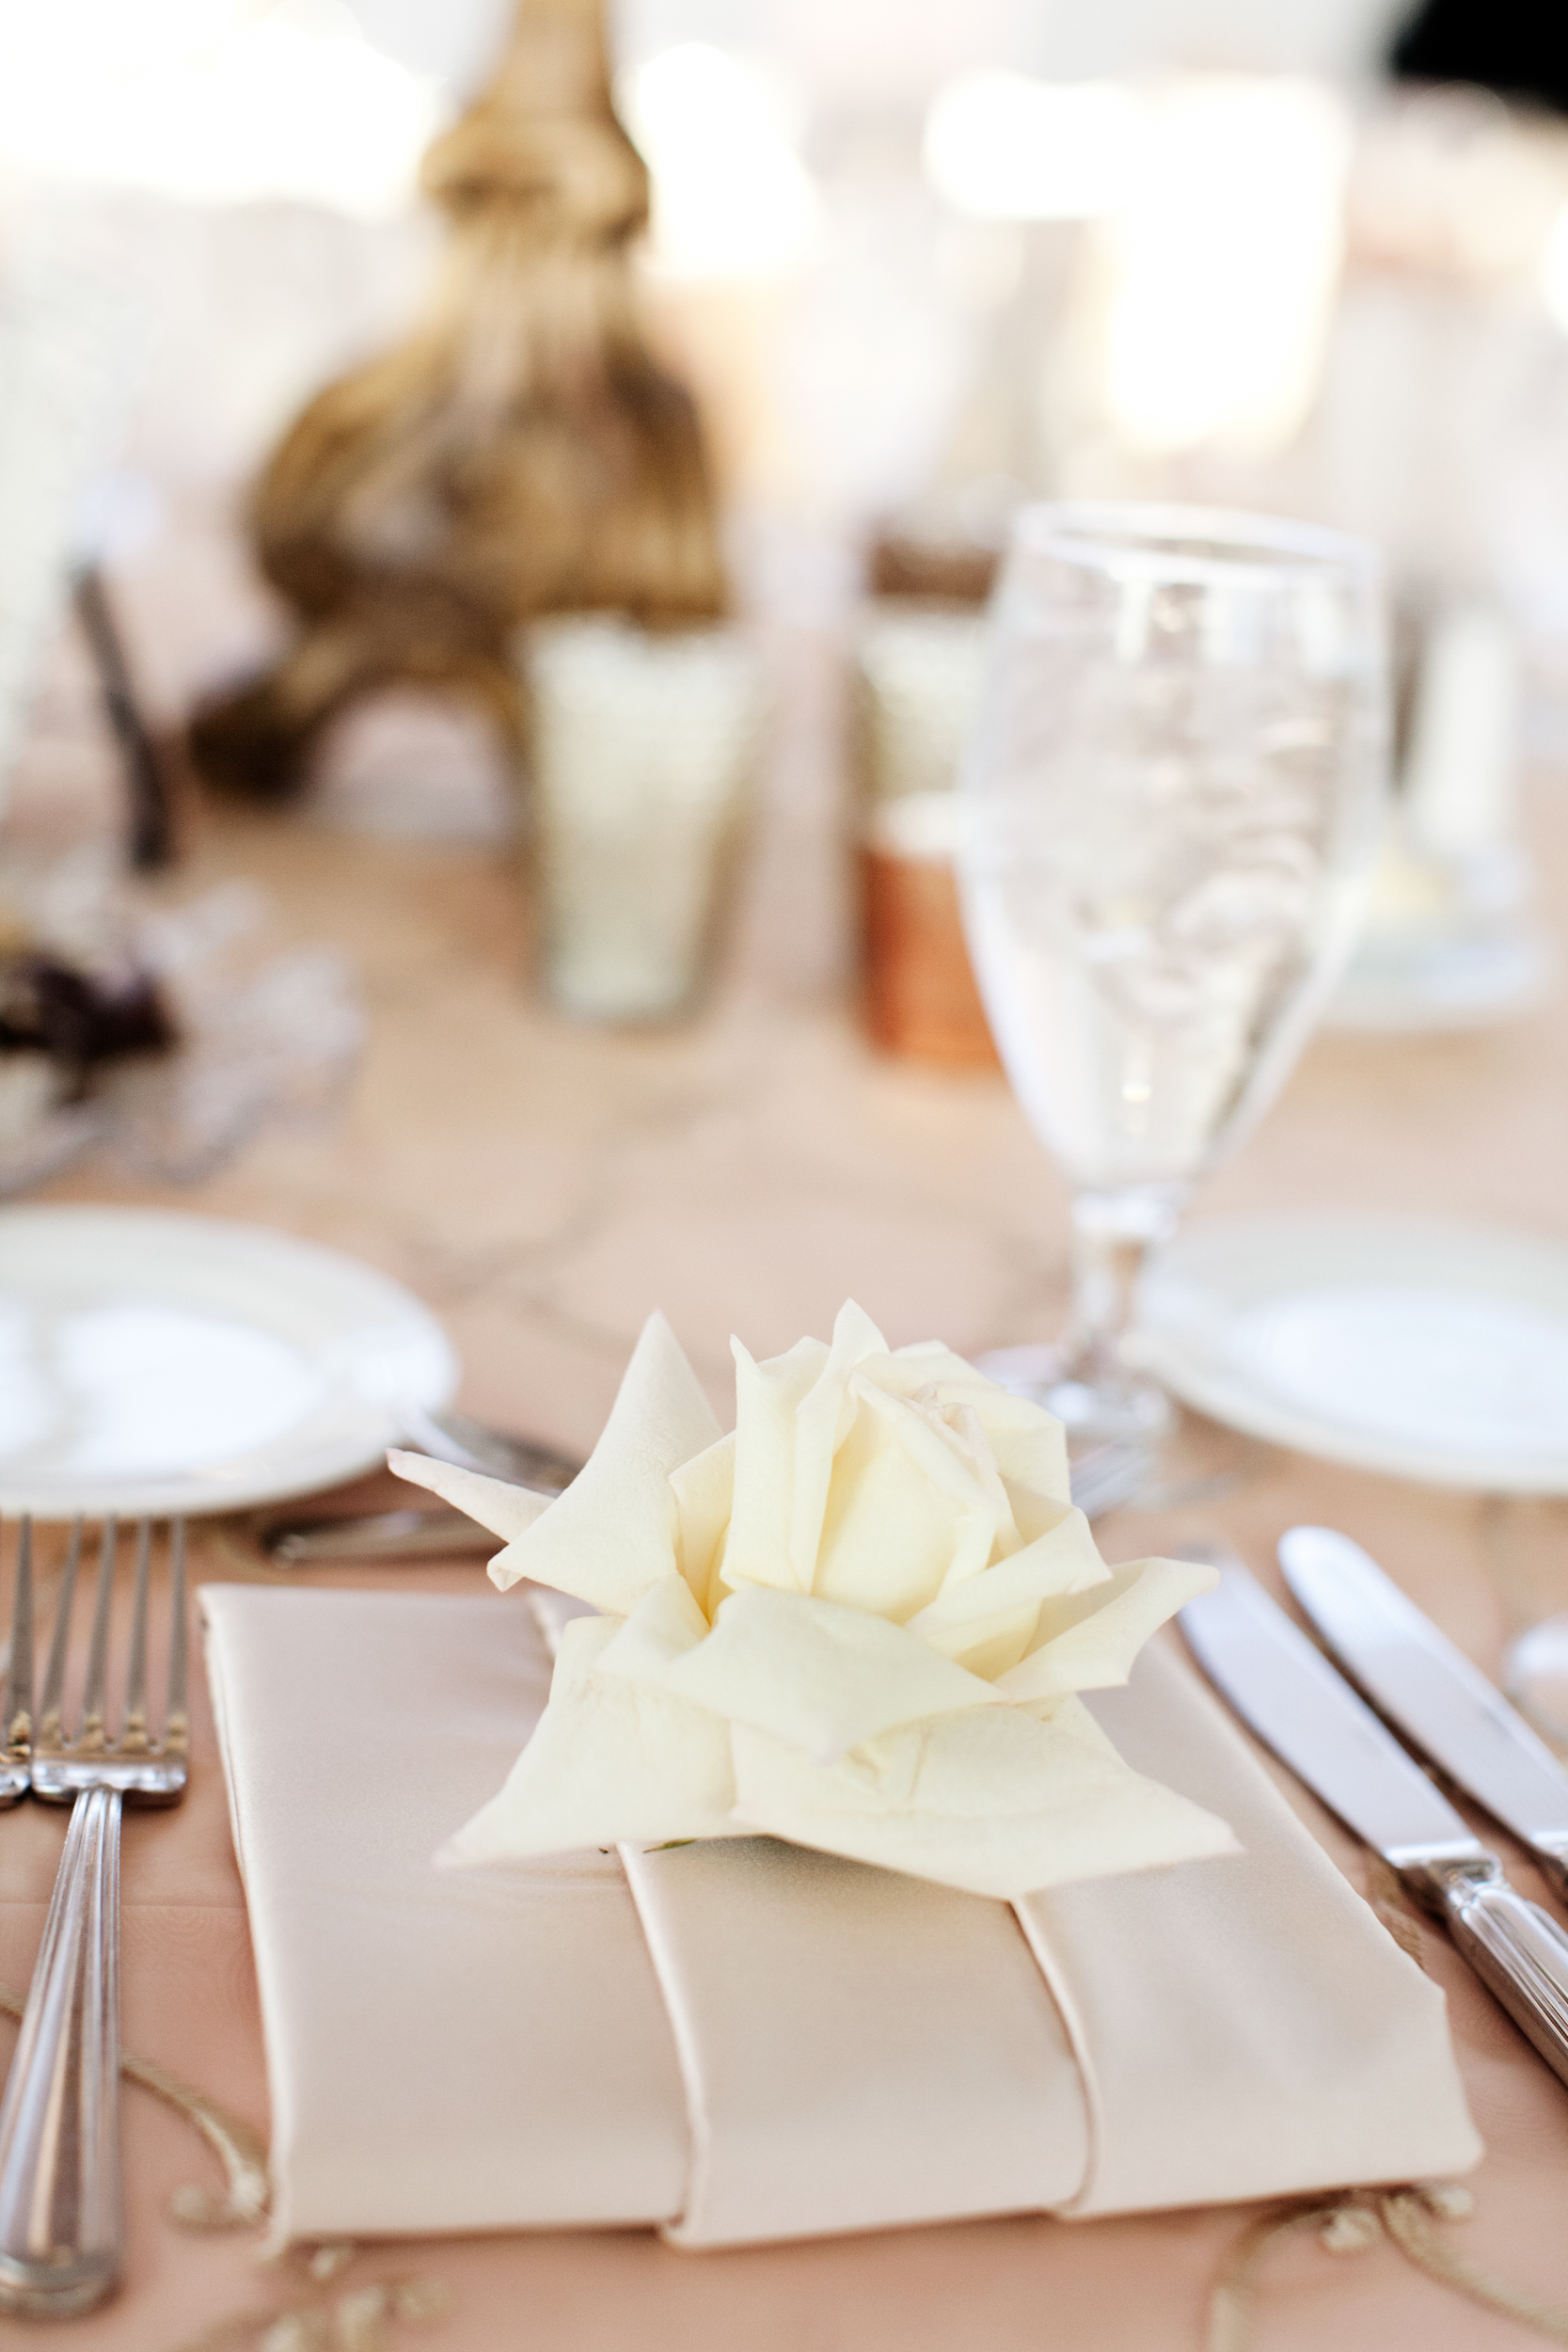 Ceci_New_York_Ceci_Style_Ceci_Johnson_Luxury_Lifestyle_Floral_Lace_Wedding_Letterpress_Inspiration_Design_Custom_Couture_Personalized_Invitations_-127.jpg